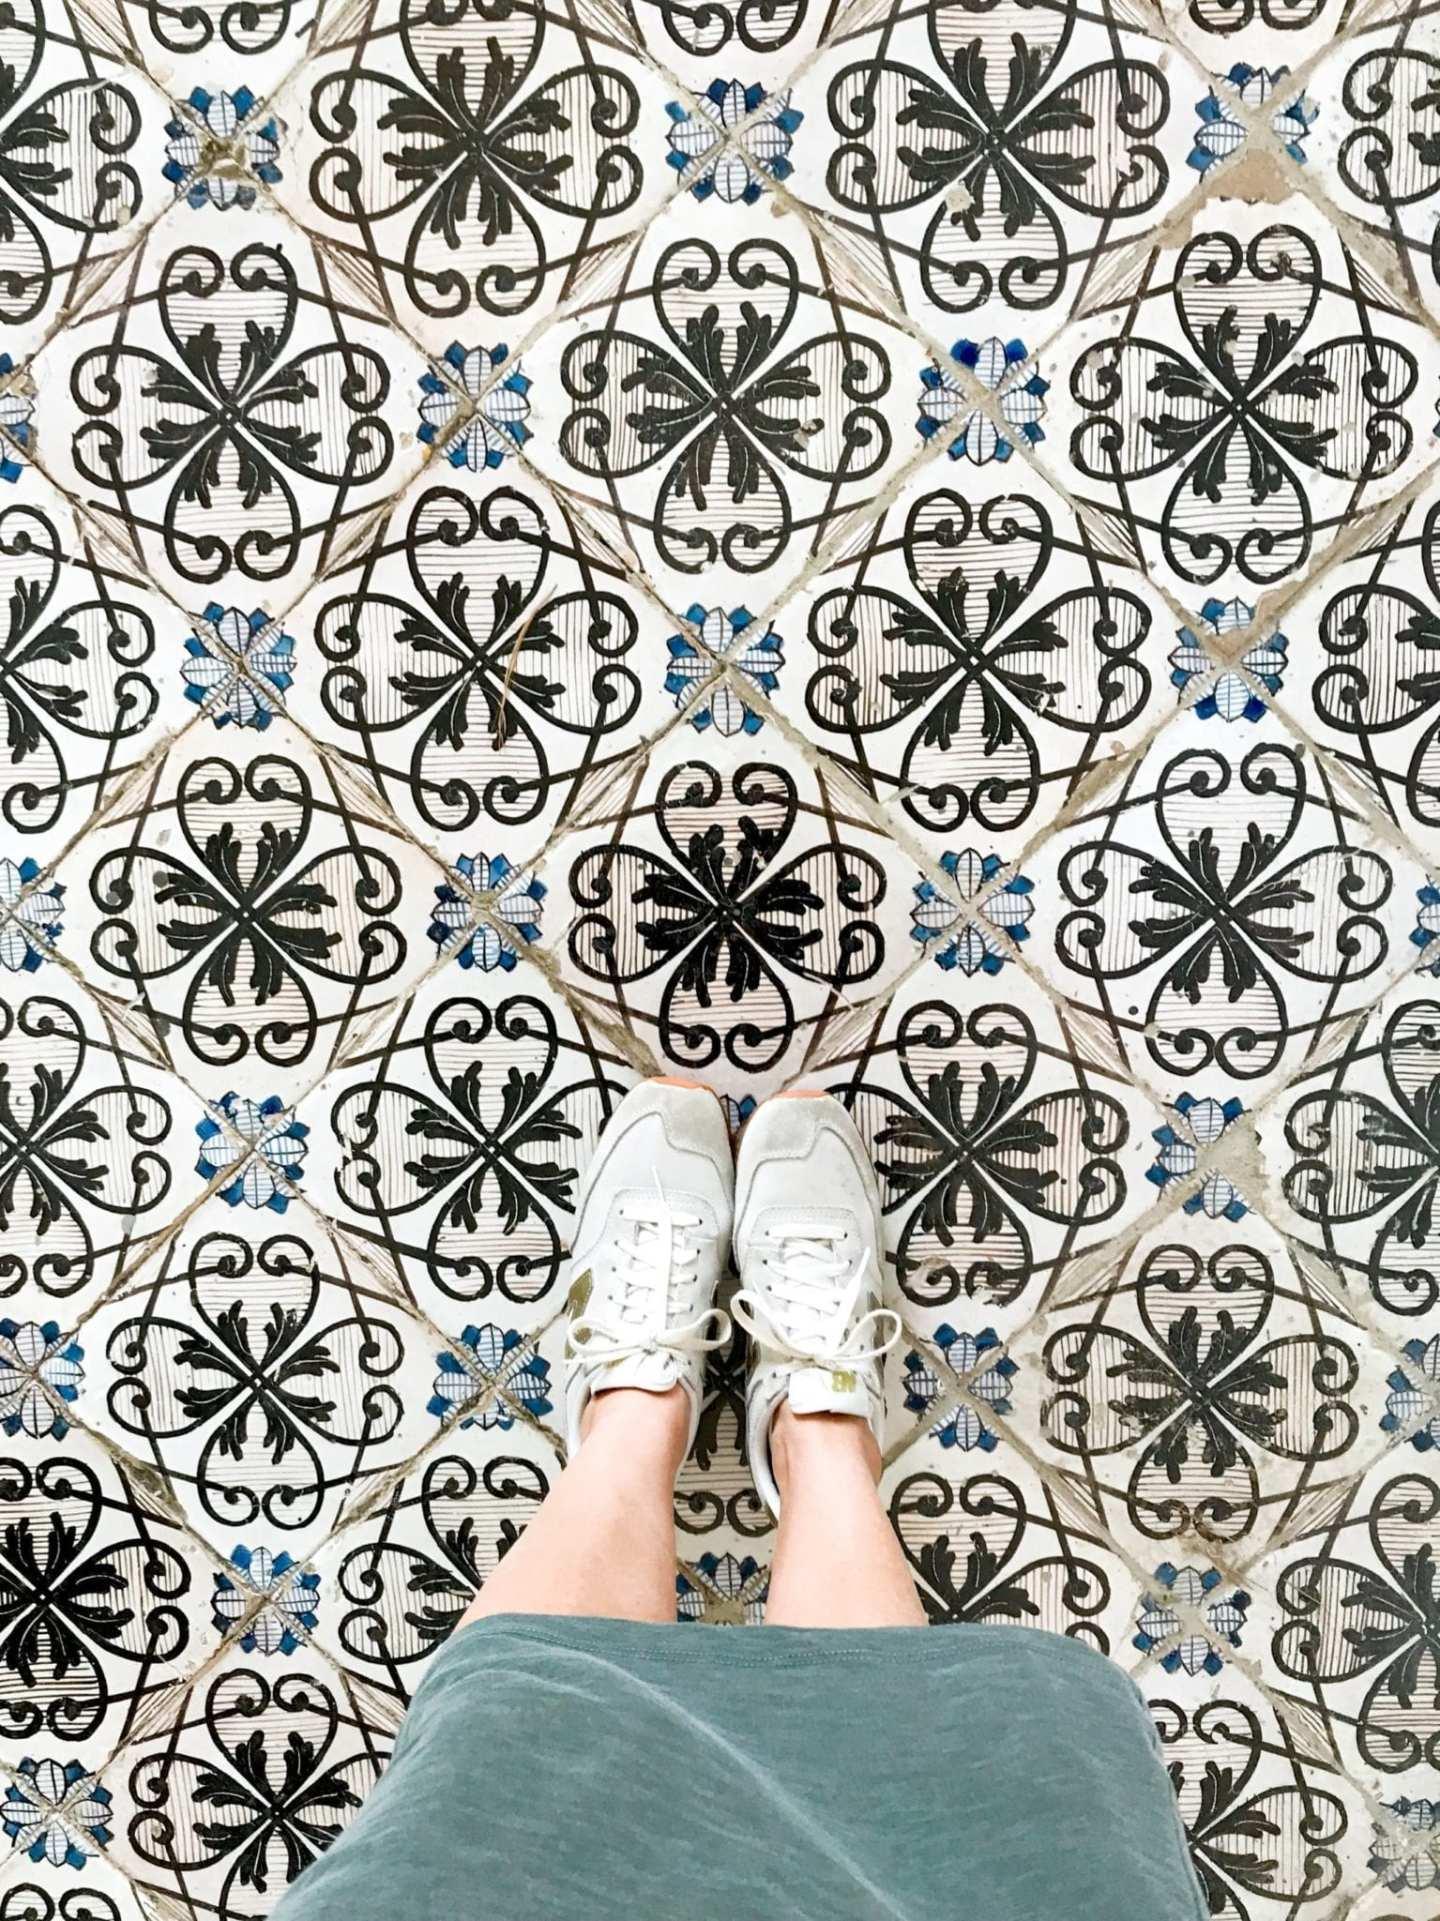 Tile work in Italy. Activities in Ravello, Italy.